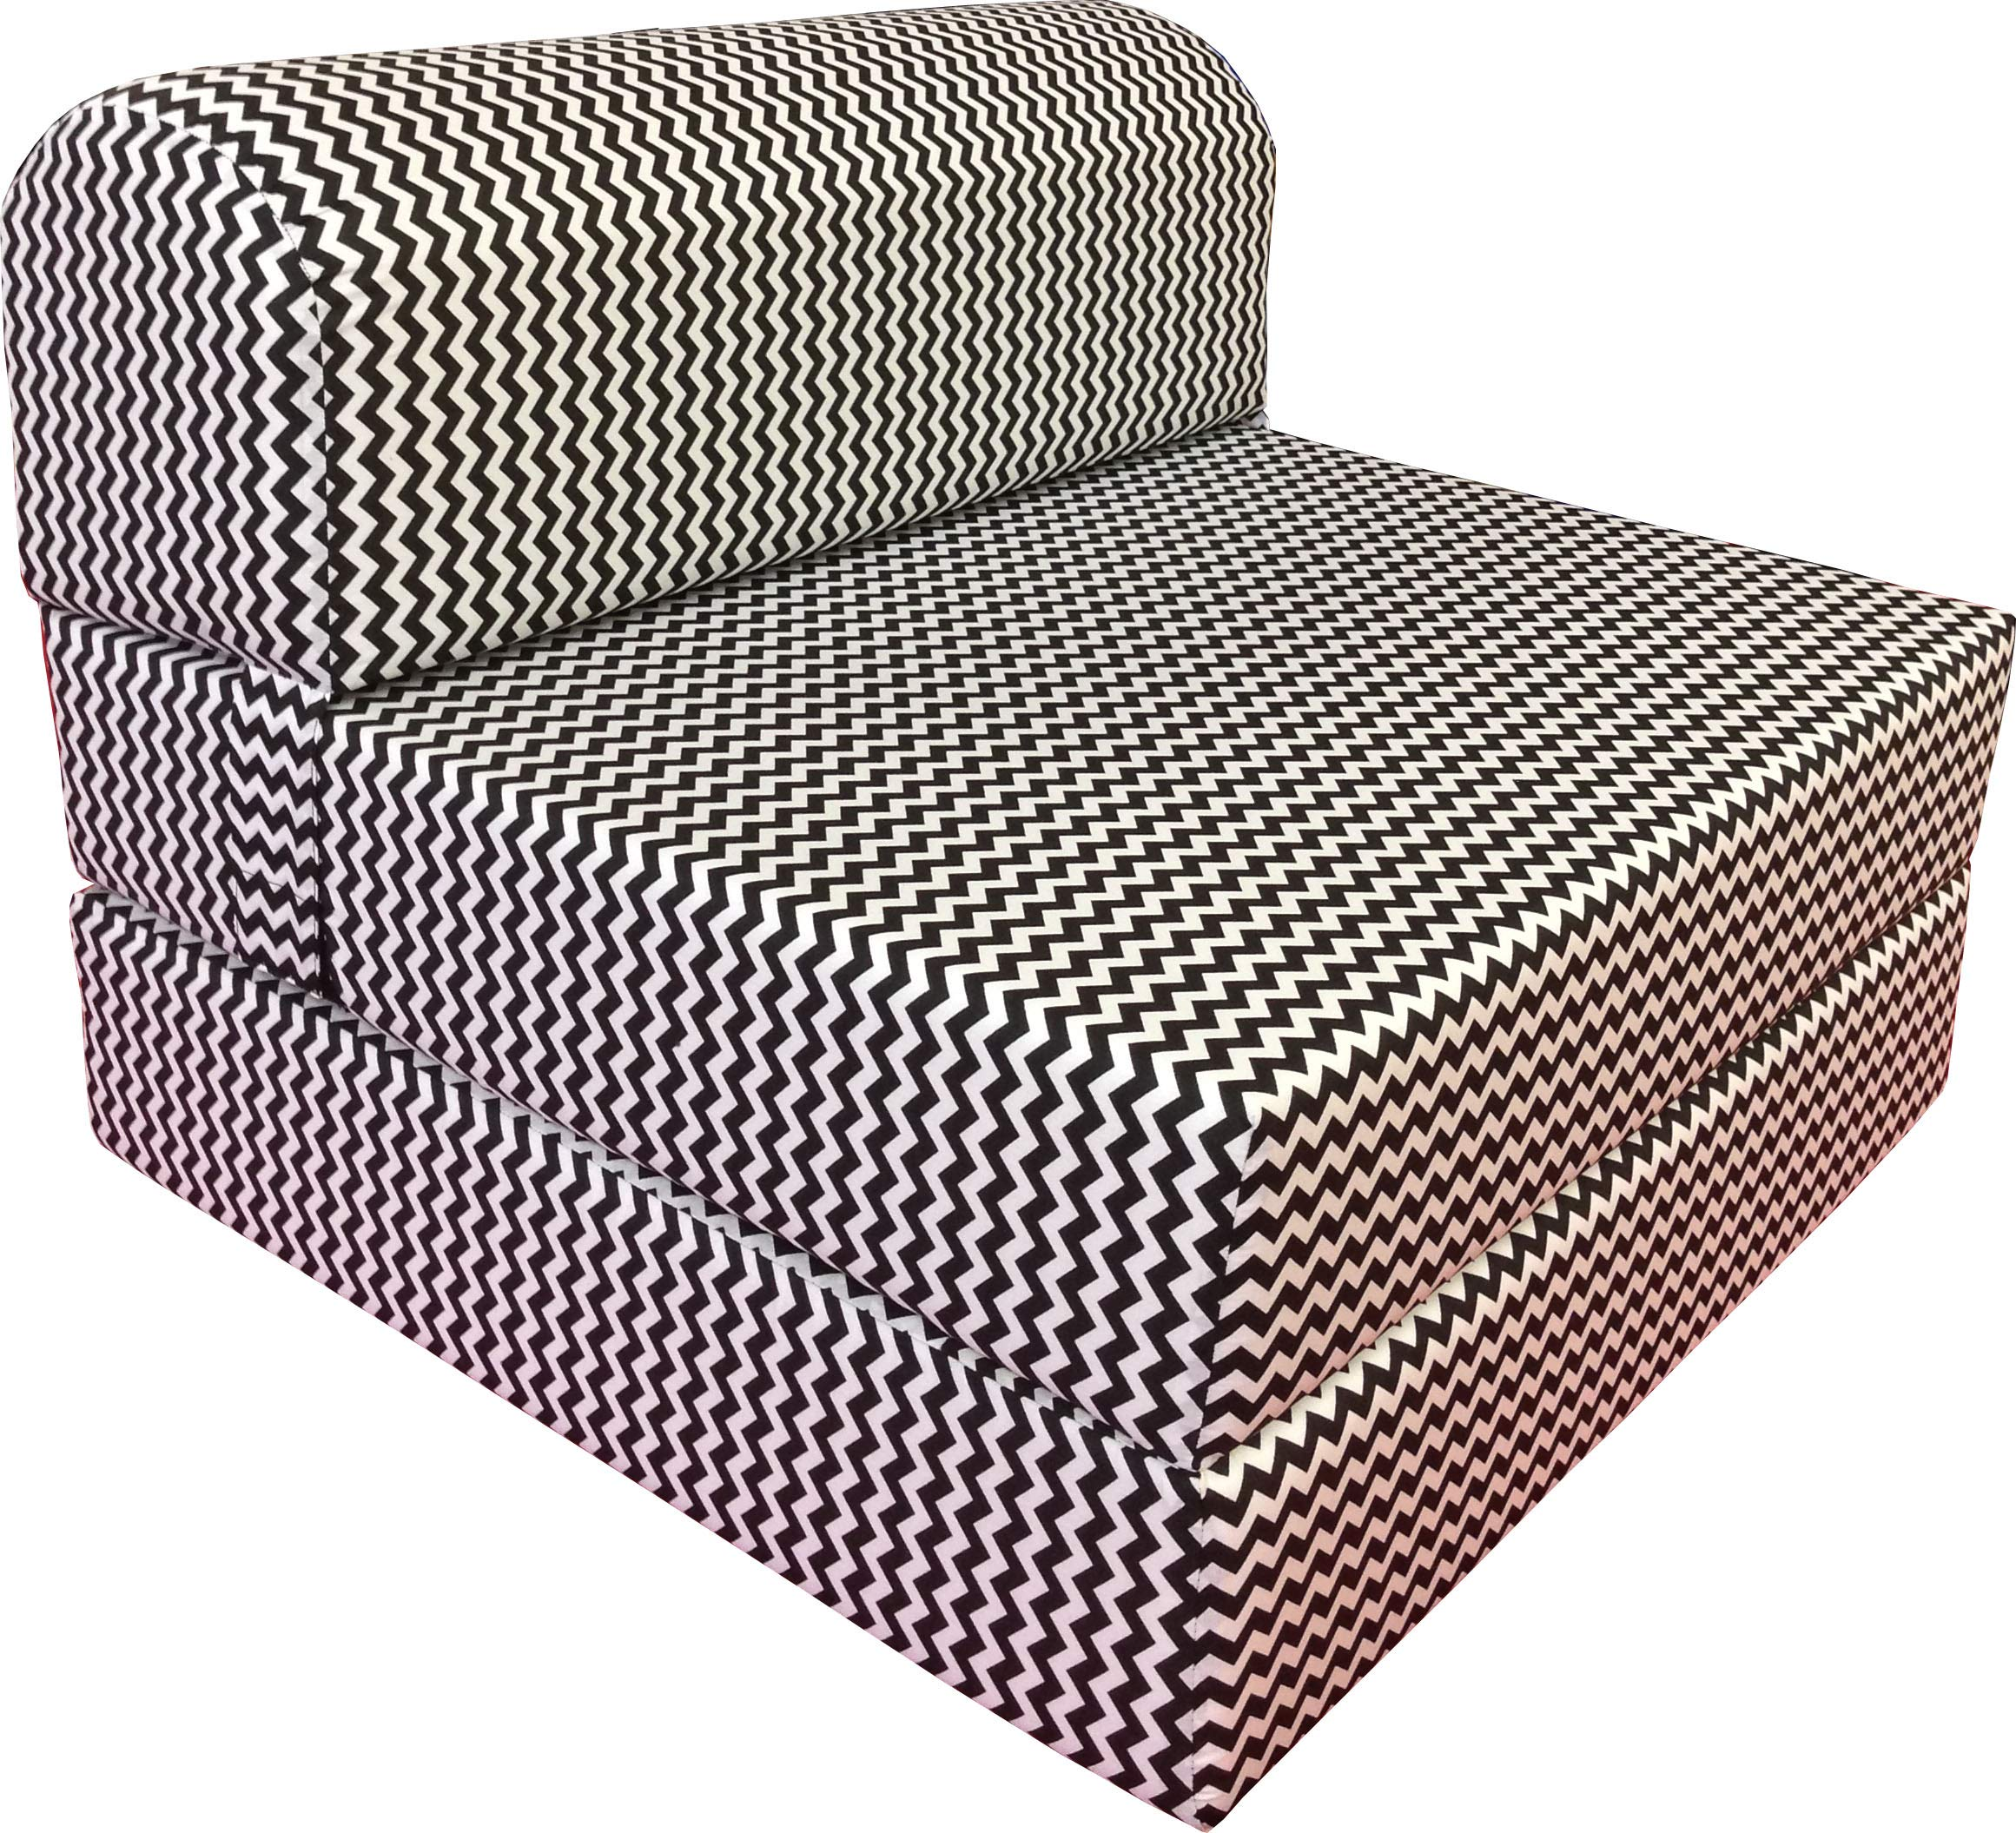 - Amazon.com: D&D Futon Furniture Black White Zig Zag Sleeper Chair